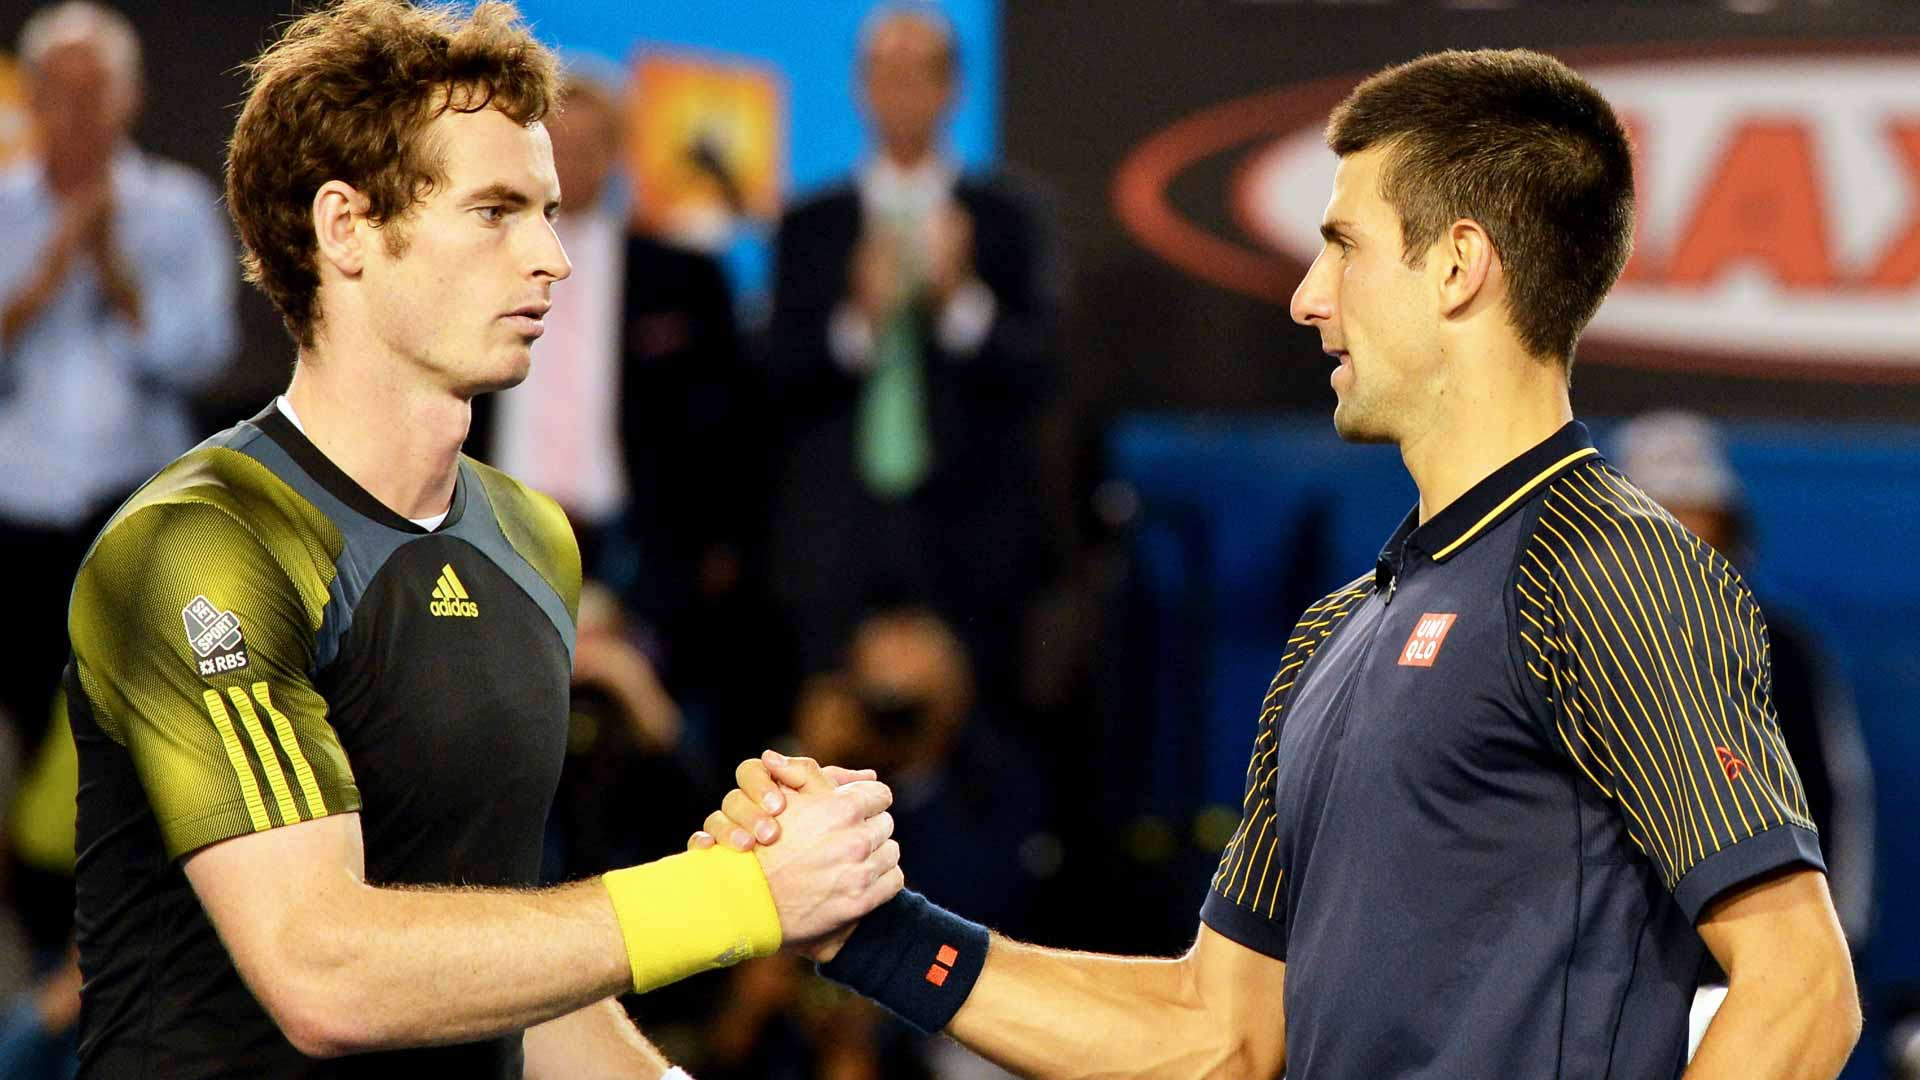 Murray Djokovic rivalries of decade 2019